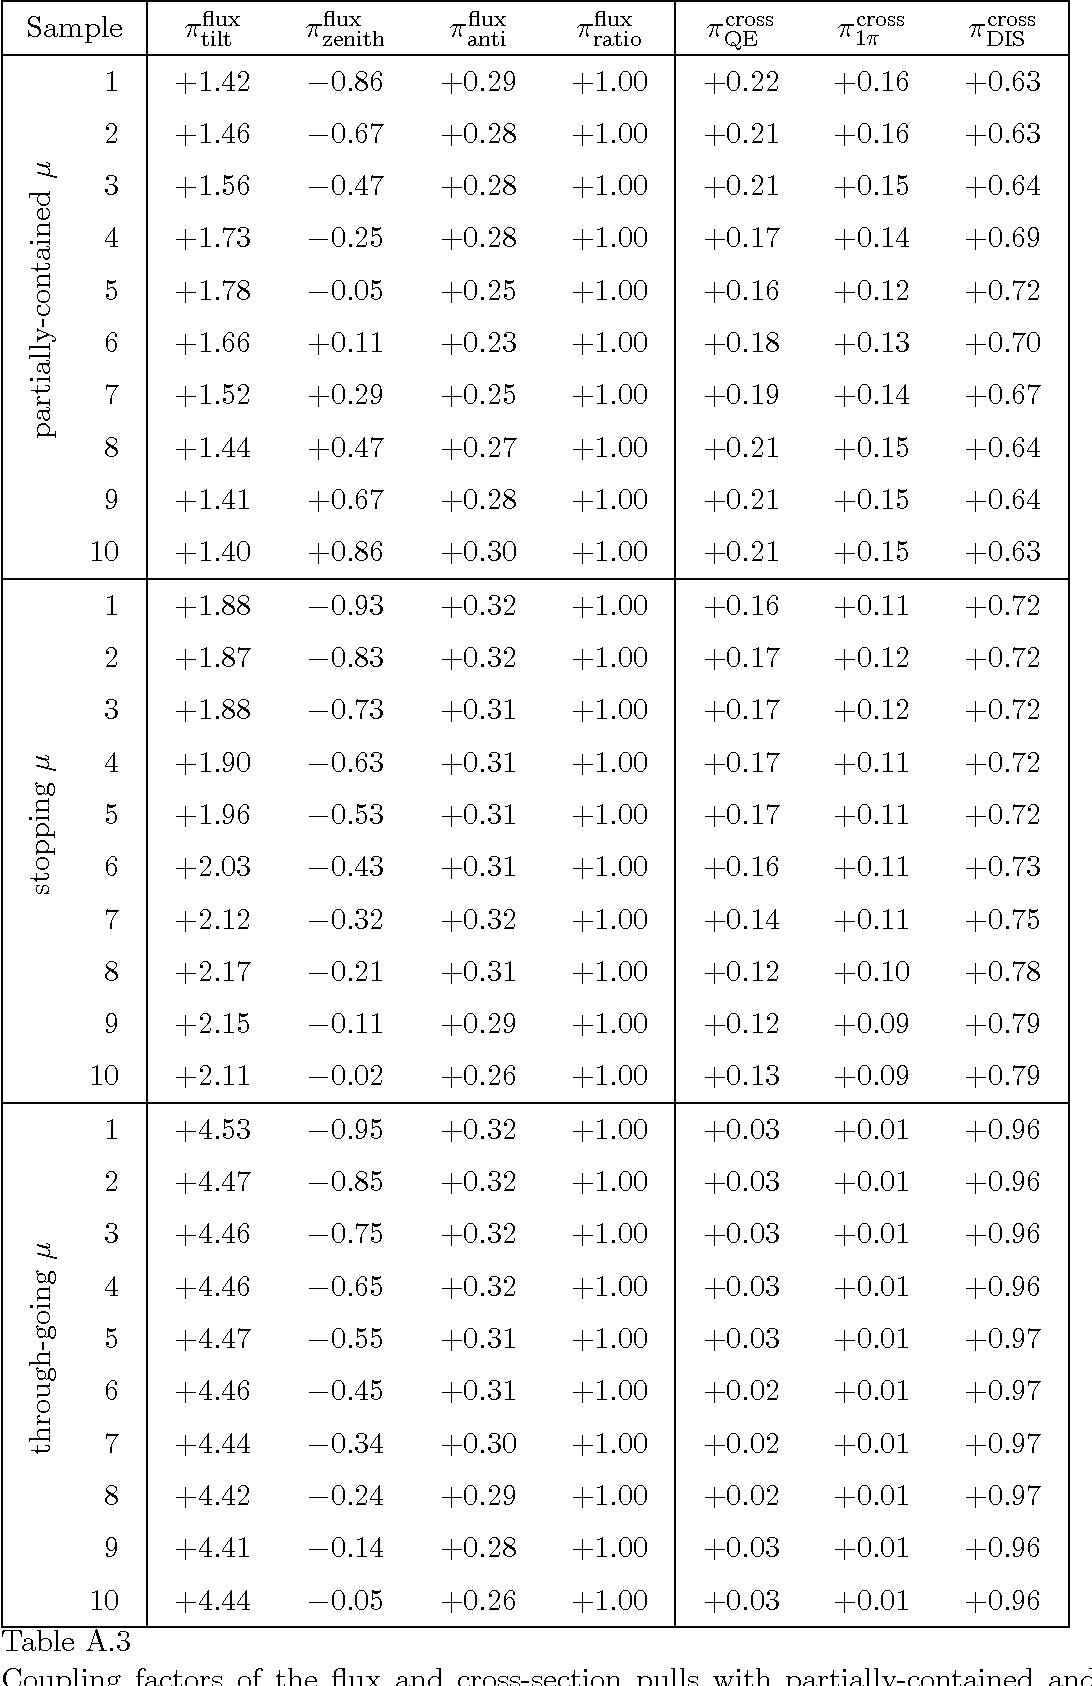 table A.3